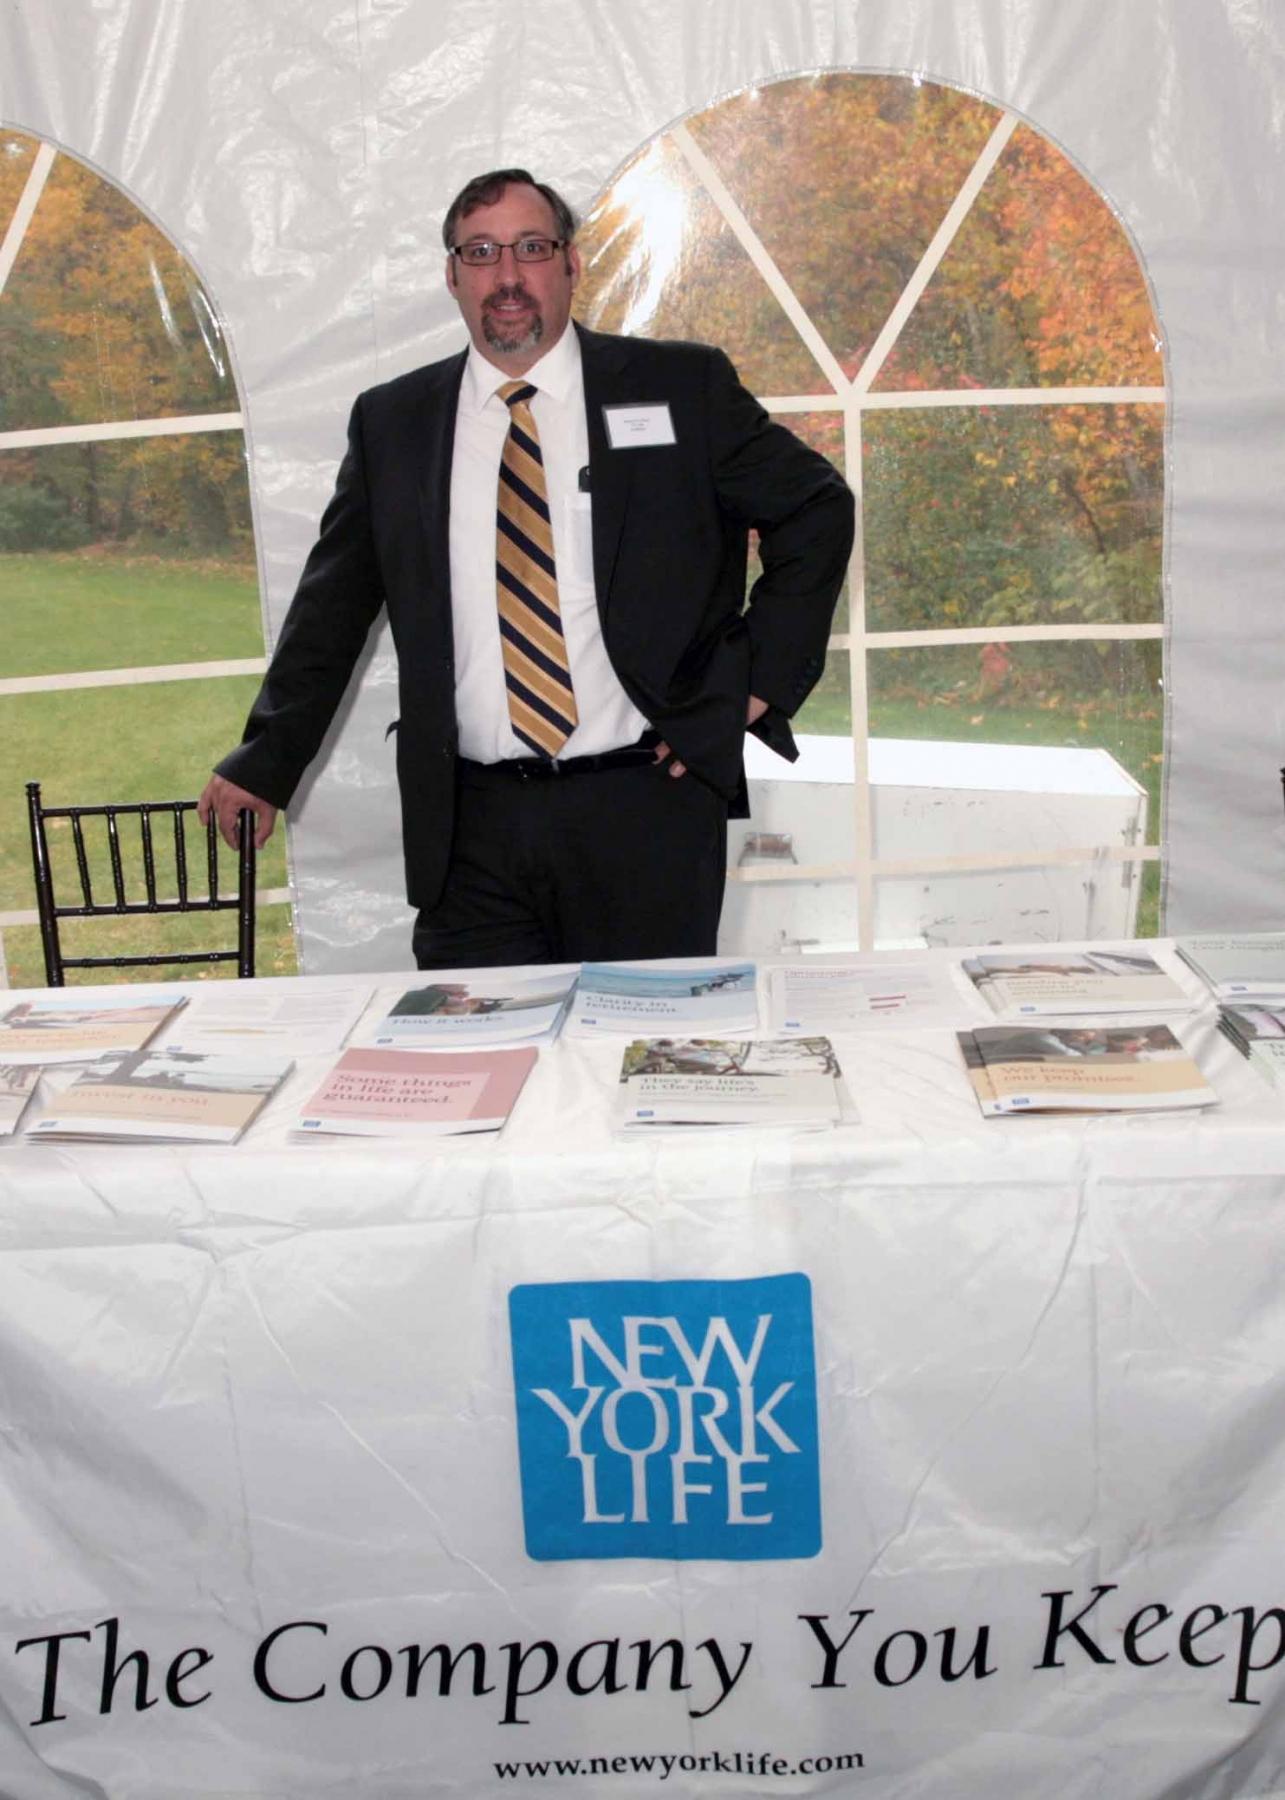 Rob Crocker, NY Life Agent, MA PTA Health Summit Vendor